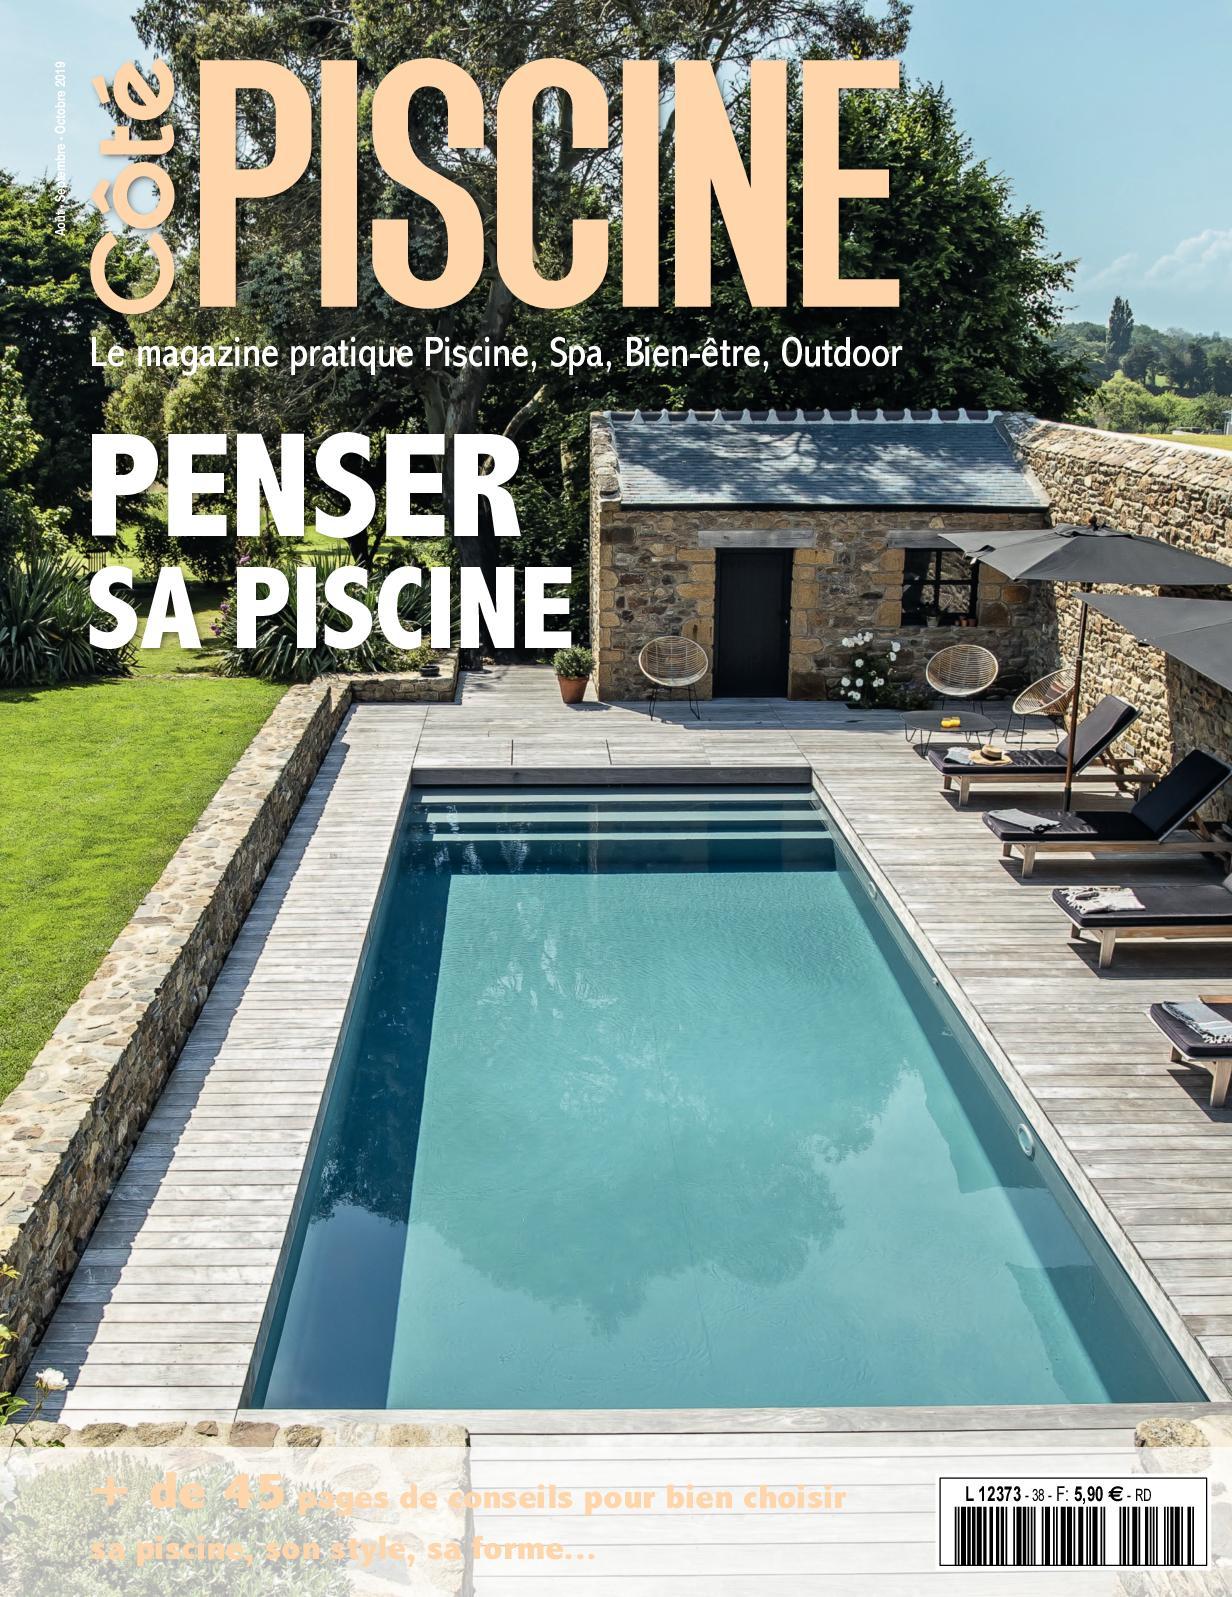 Calaméo - Cote Piscine N° 38 encequiconcerne Piscine Vinet